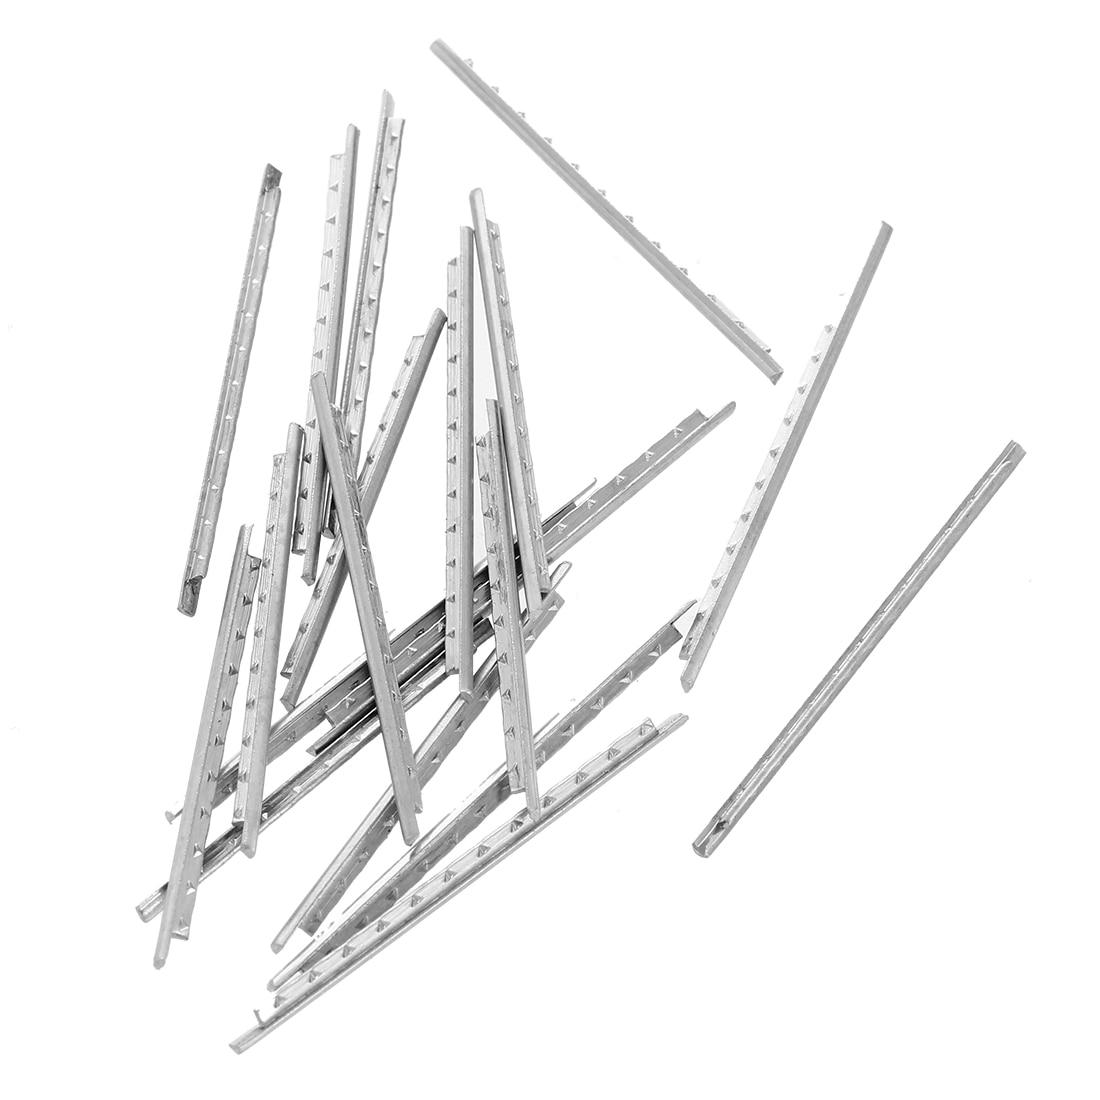 "19pcs Fret Wire Copper Fretwire Set 1.7mm For 26"" Ukulele"